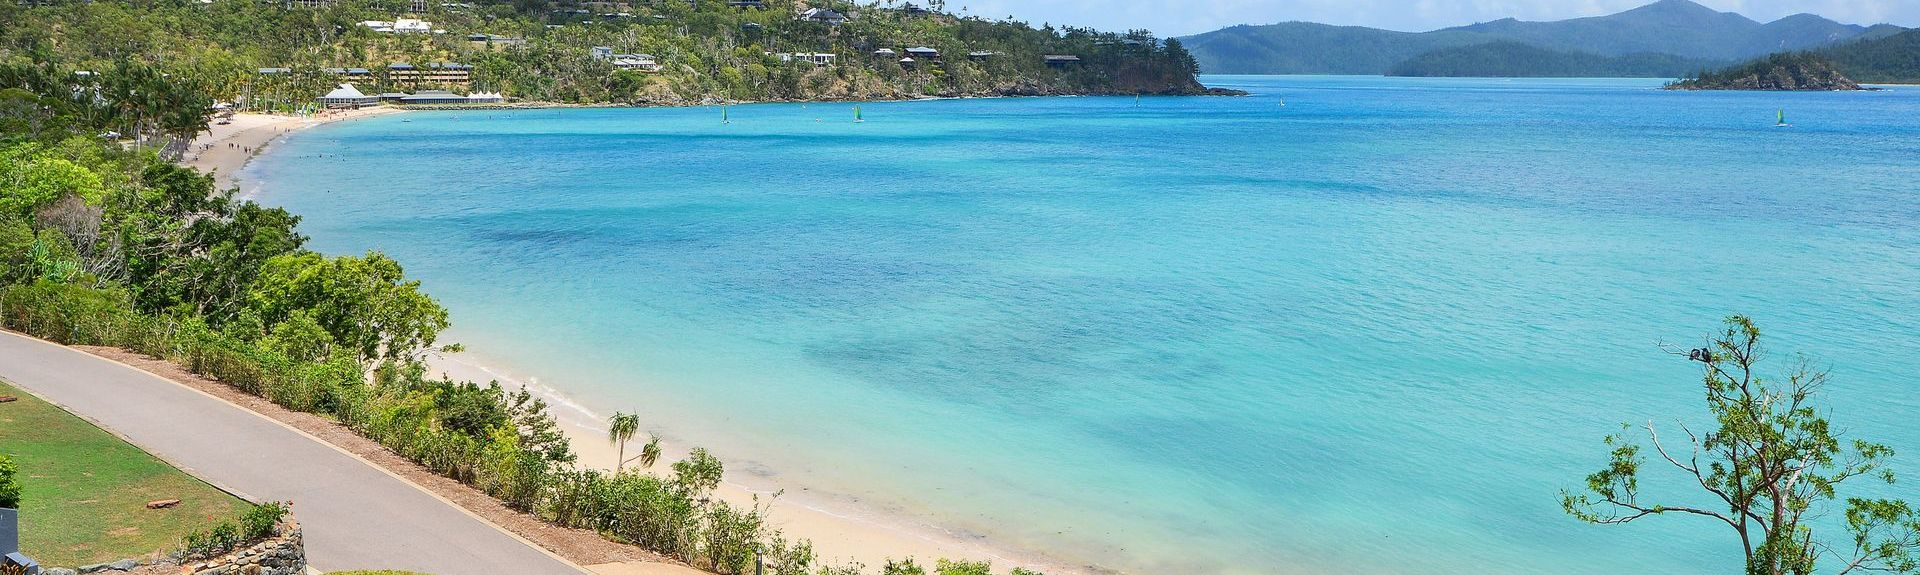 Daydream Reef, Daydream Island, Queensland, Australia